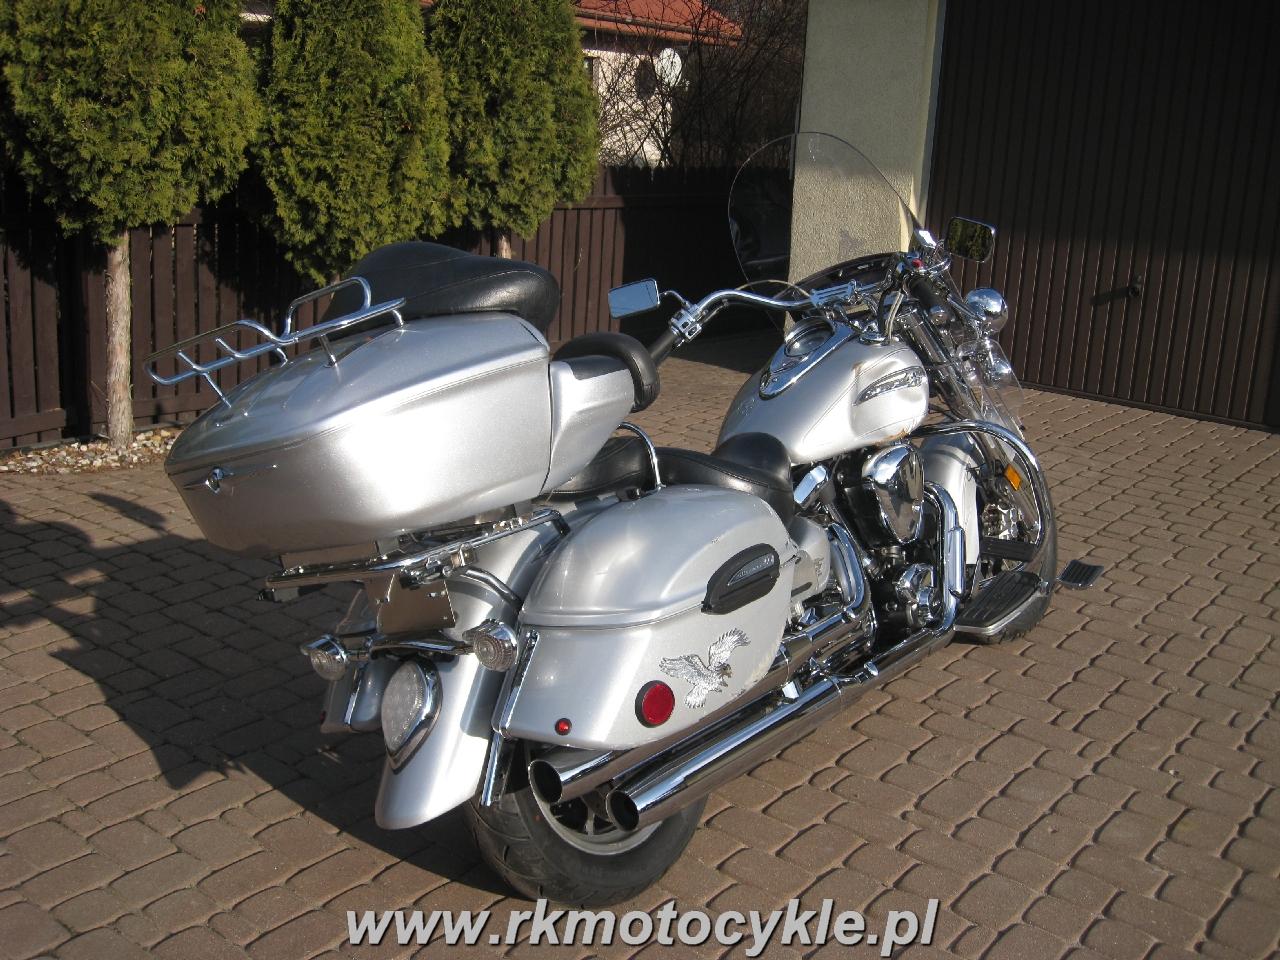 Brp Can Am >> RK MOTOCYKLE - YAMAHA XV 1700 ROAD STAR SILVERADO SPECIAL EDITION